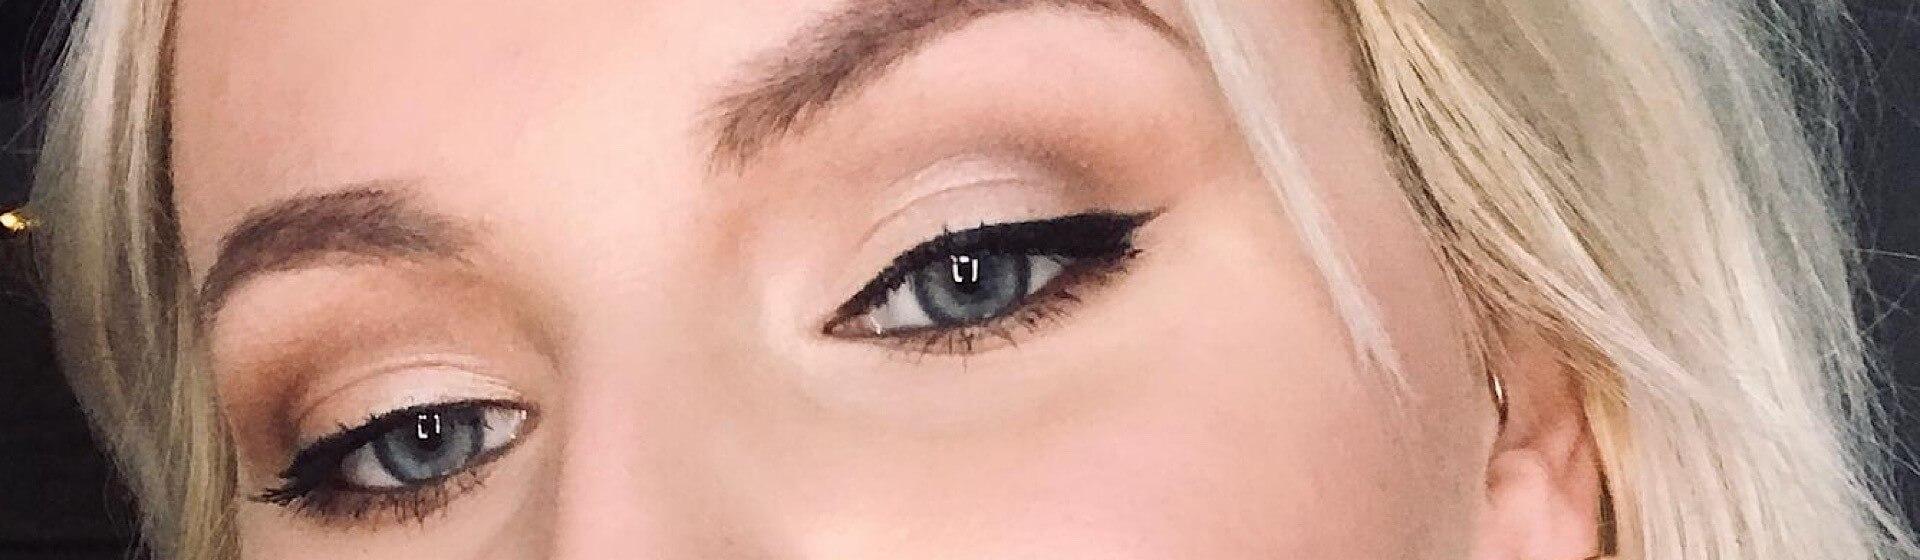 Eyeliner Beitragsbild 2